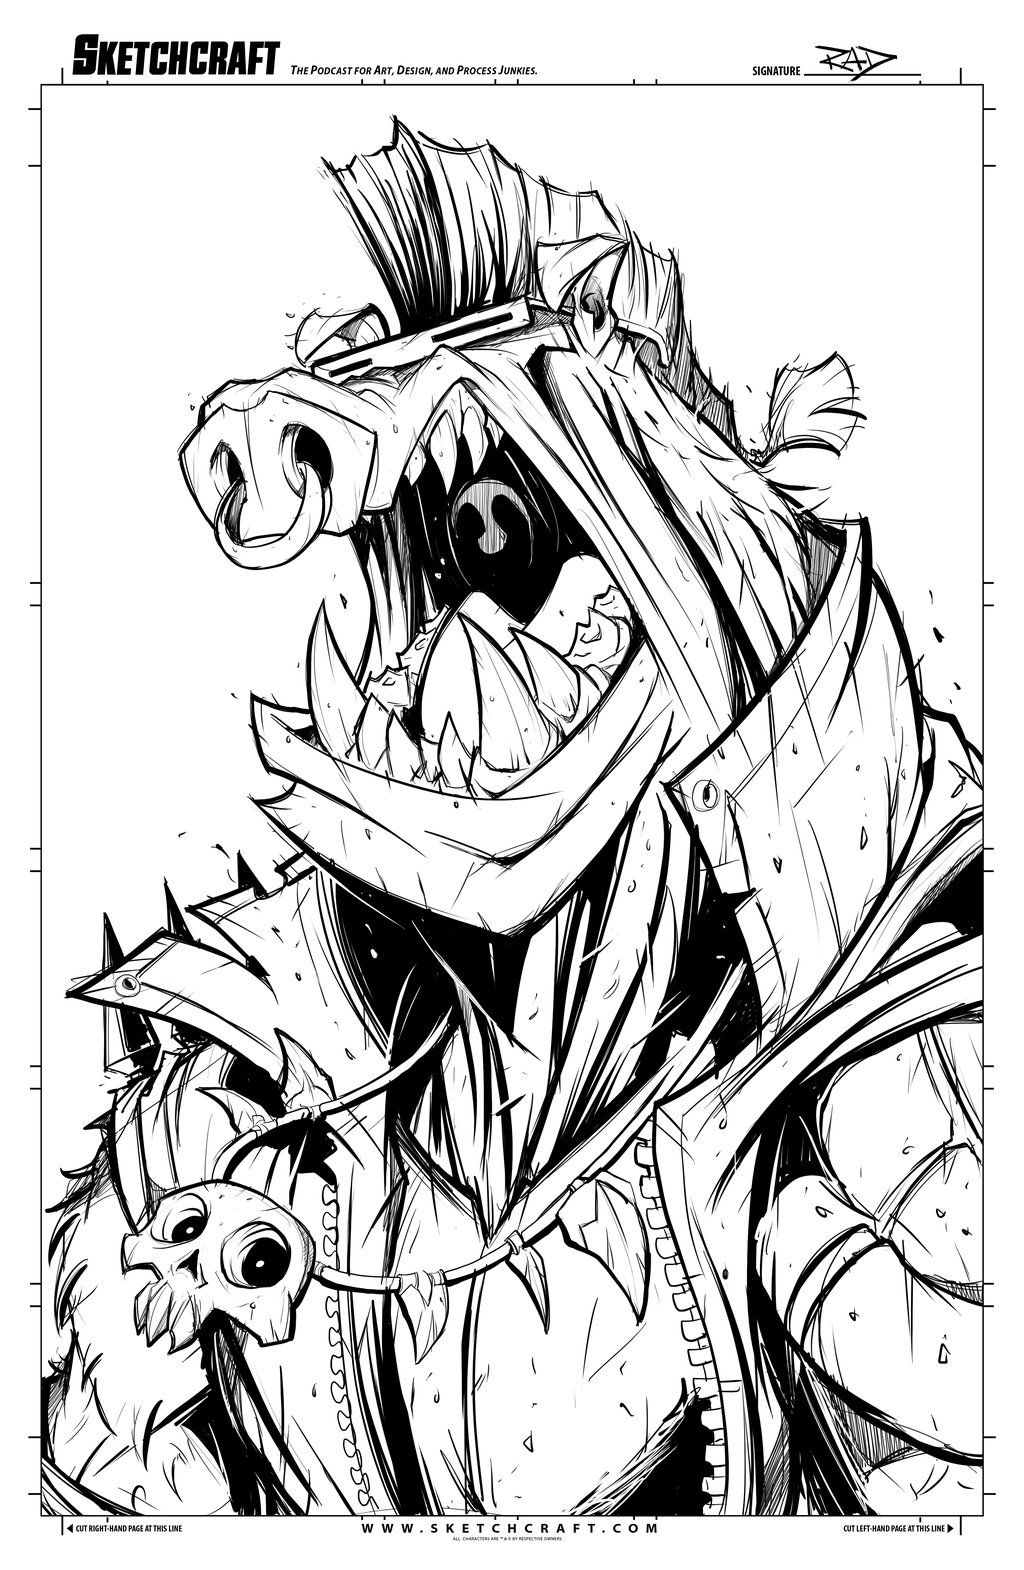 Sketches Midnight 025 By Robduenas Deviantart Com On Deviantart